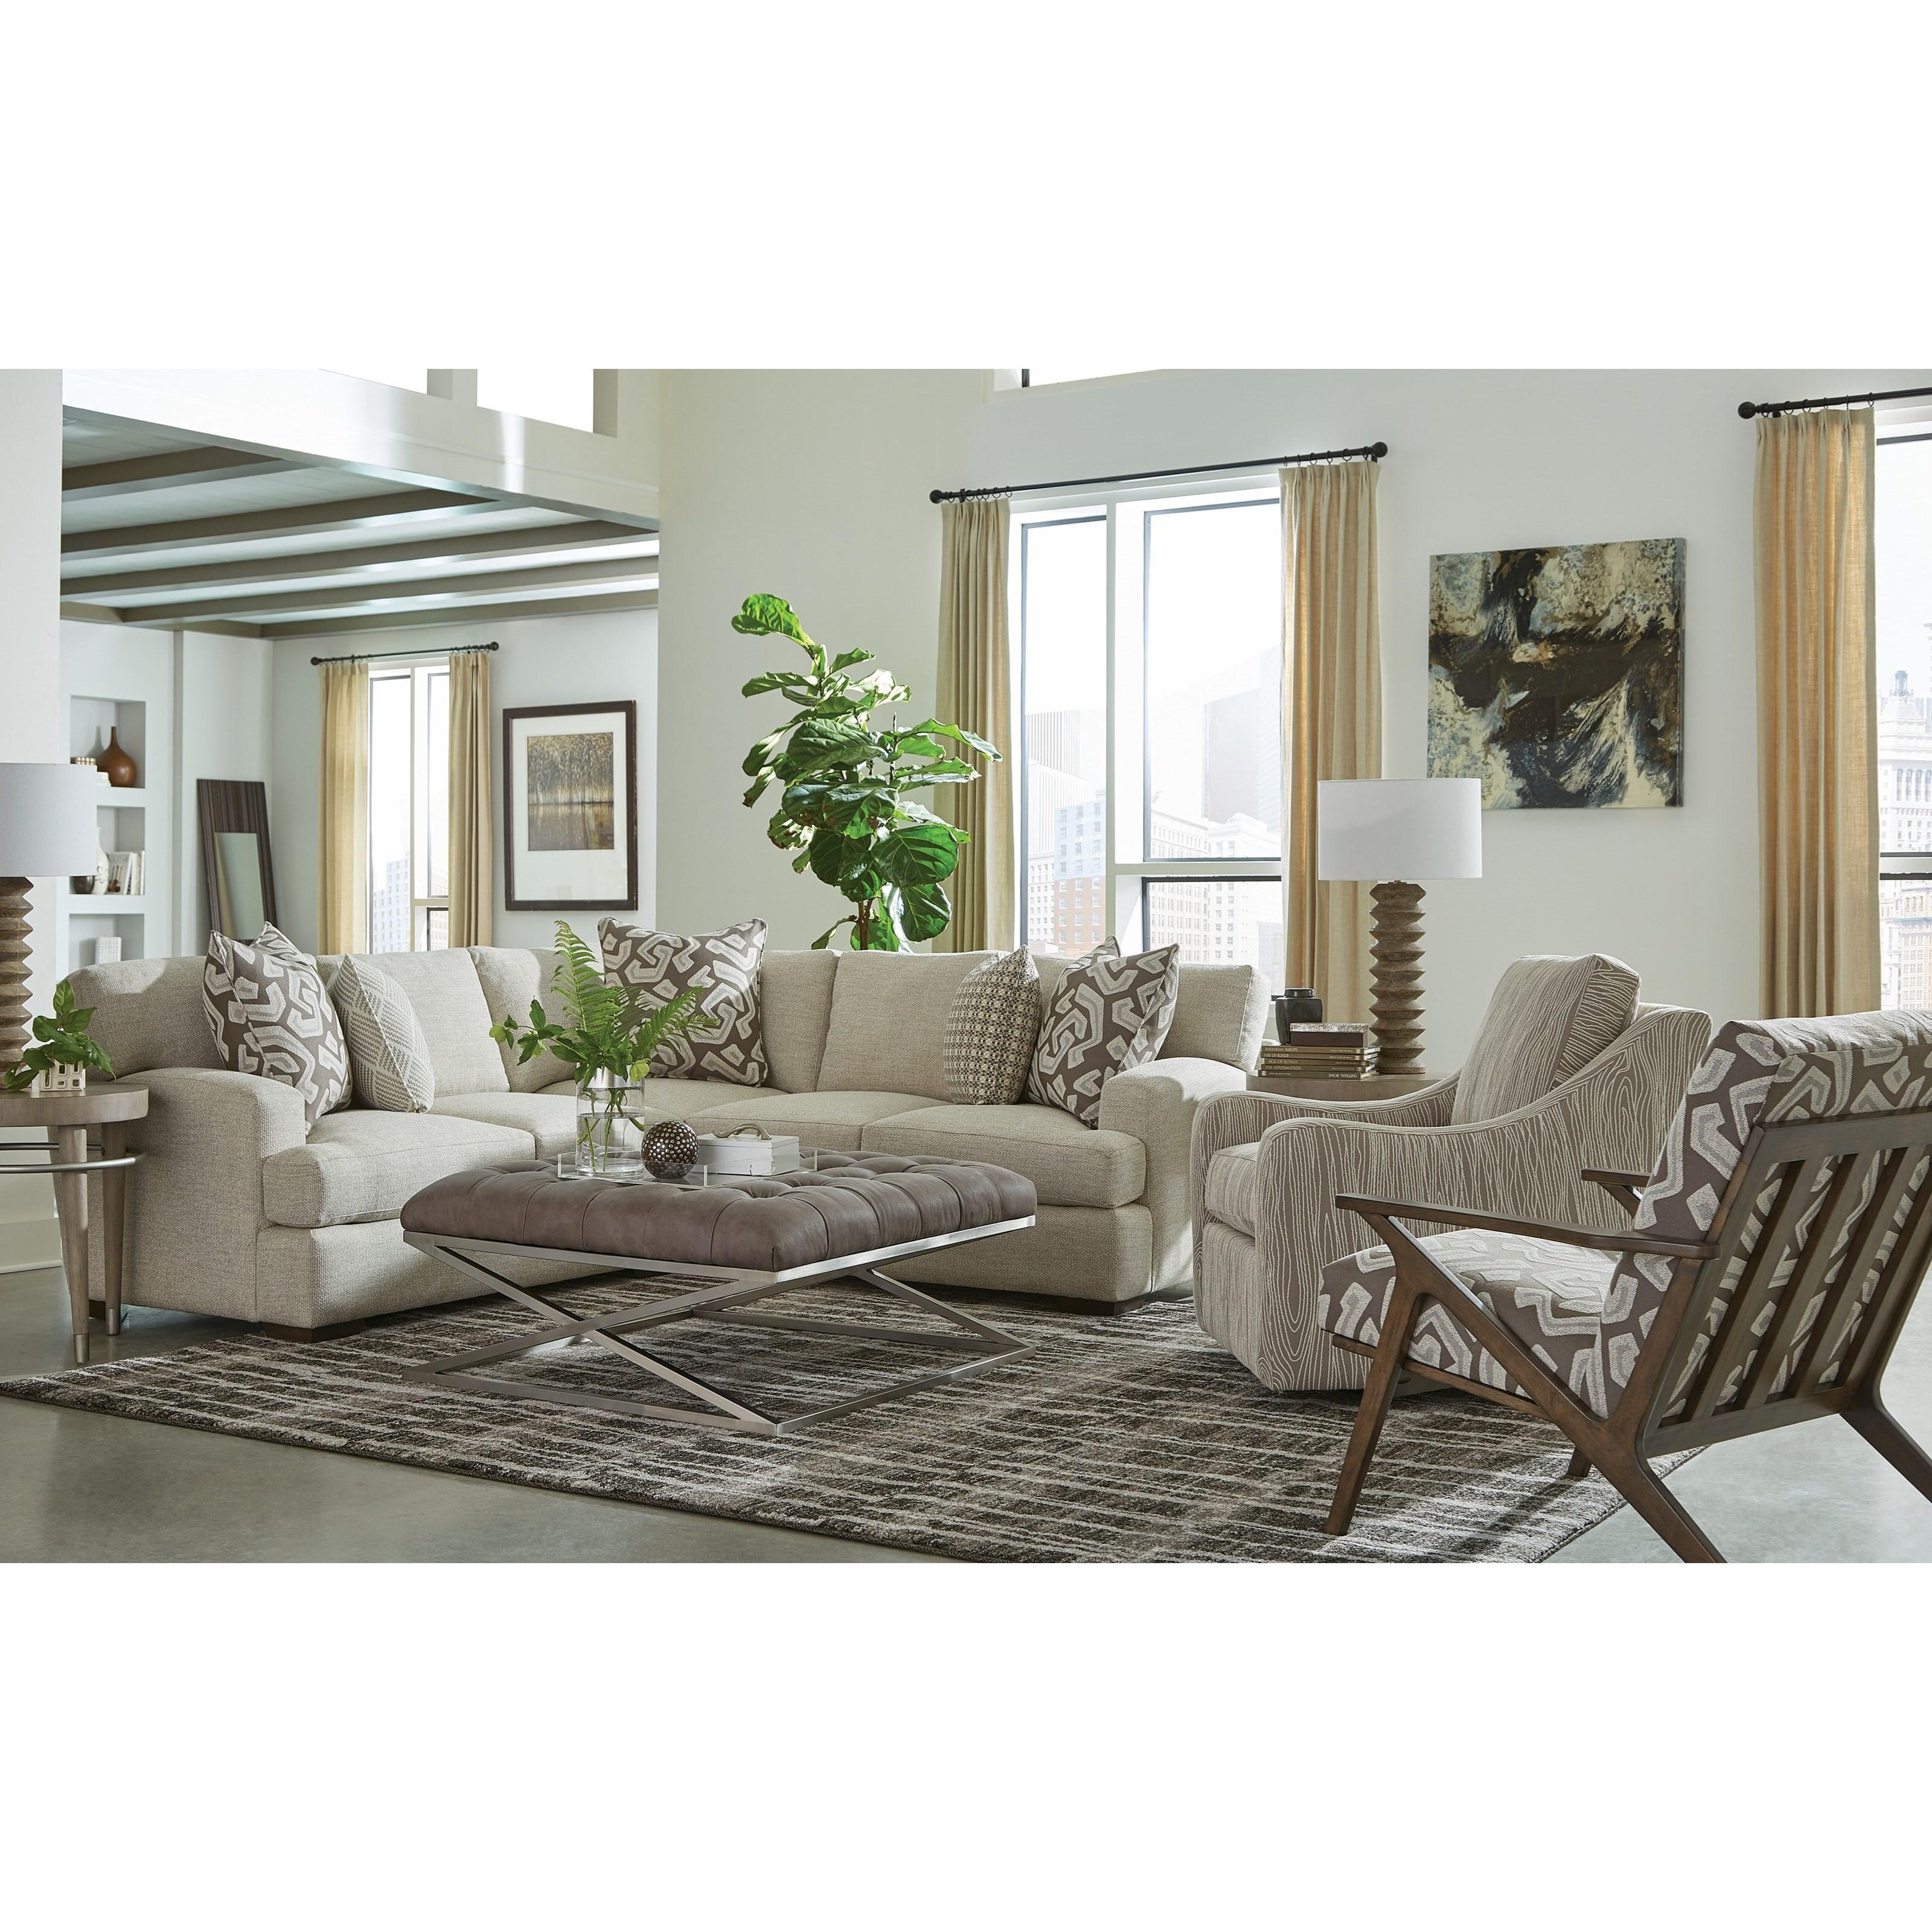 785350 4 Seat Sectional Sofa